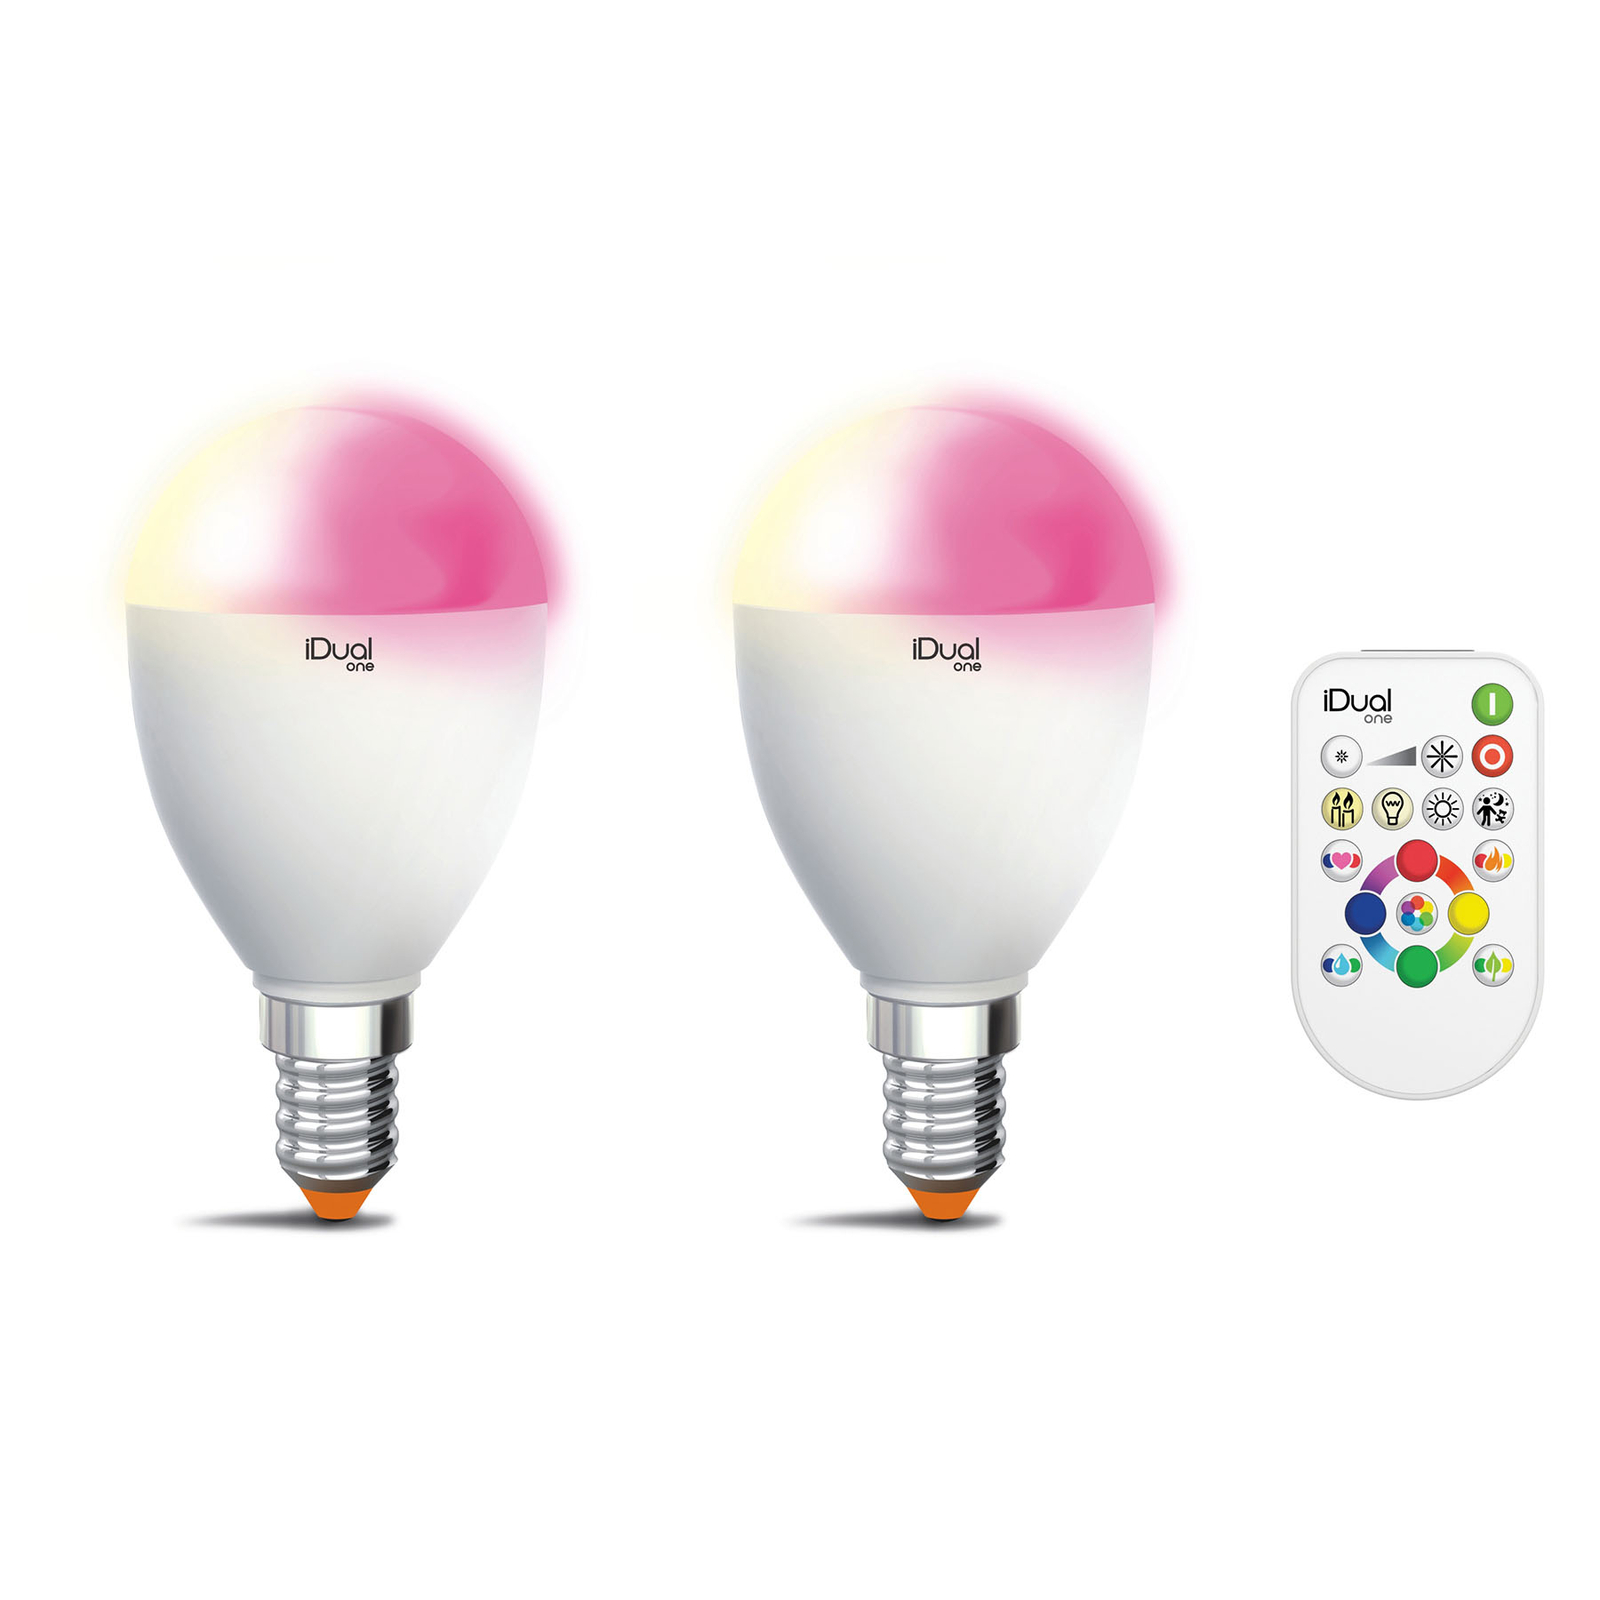 iDual One E14 5,3W RGBW 2er pakke, fjernkontroll